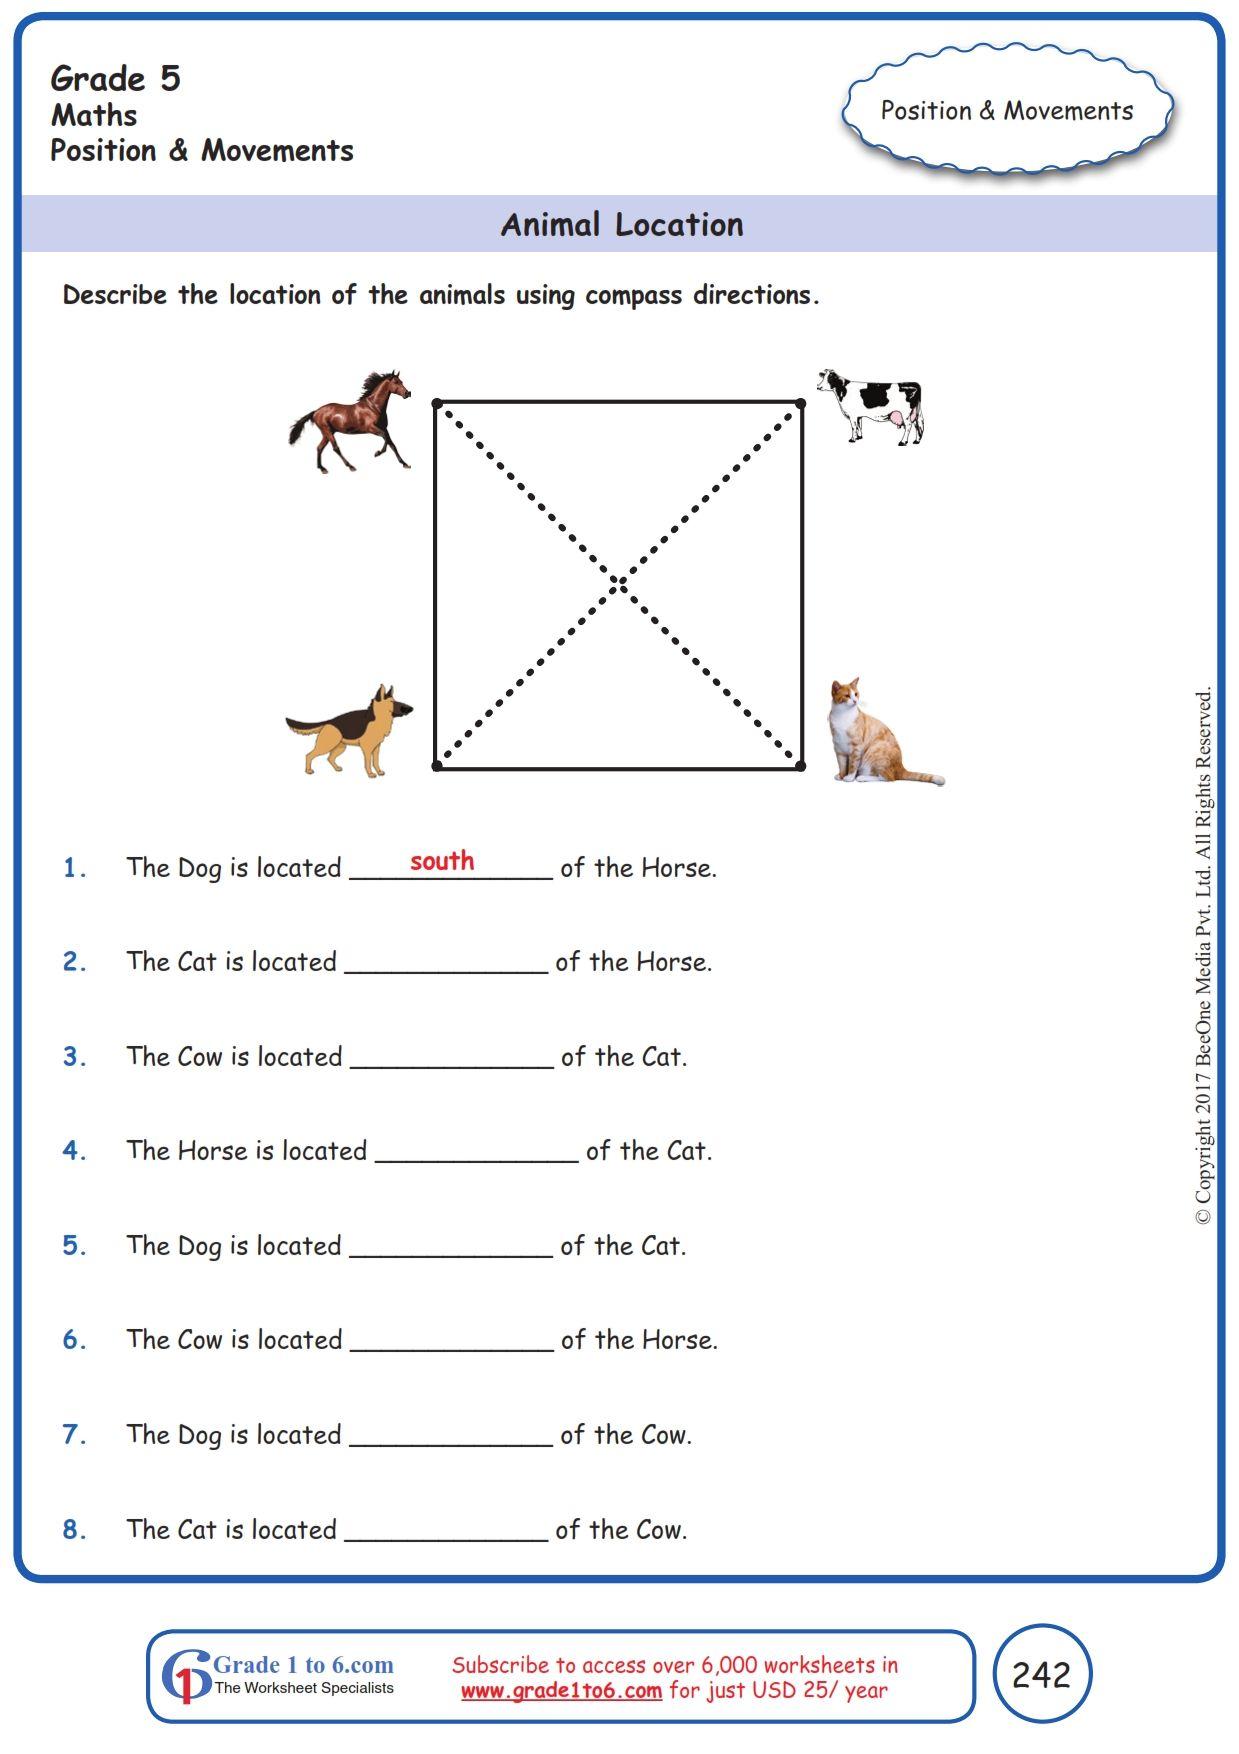 Worksheet Grade 5 Math Animal Location   Grade 5 math worksheets [ 1754 x 1239 Pixel ]